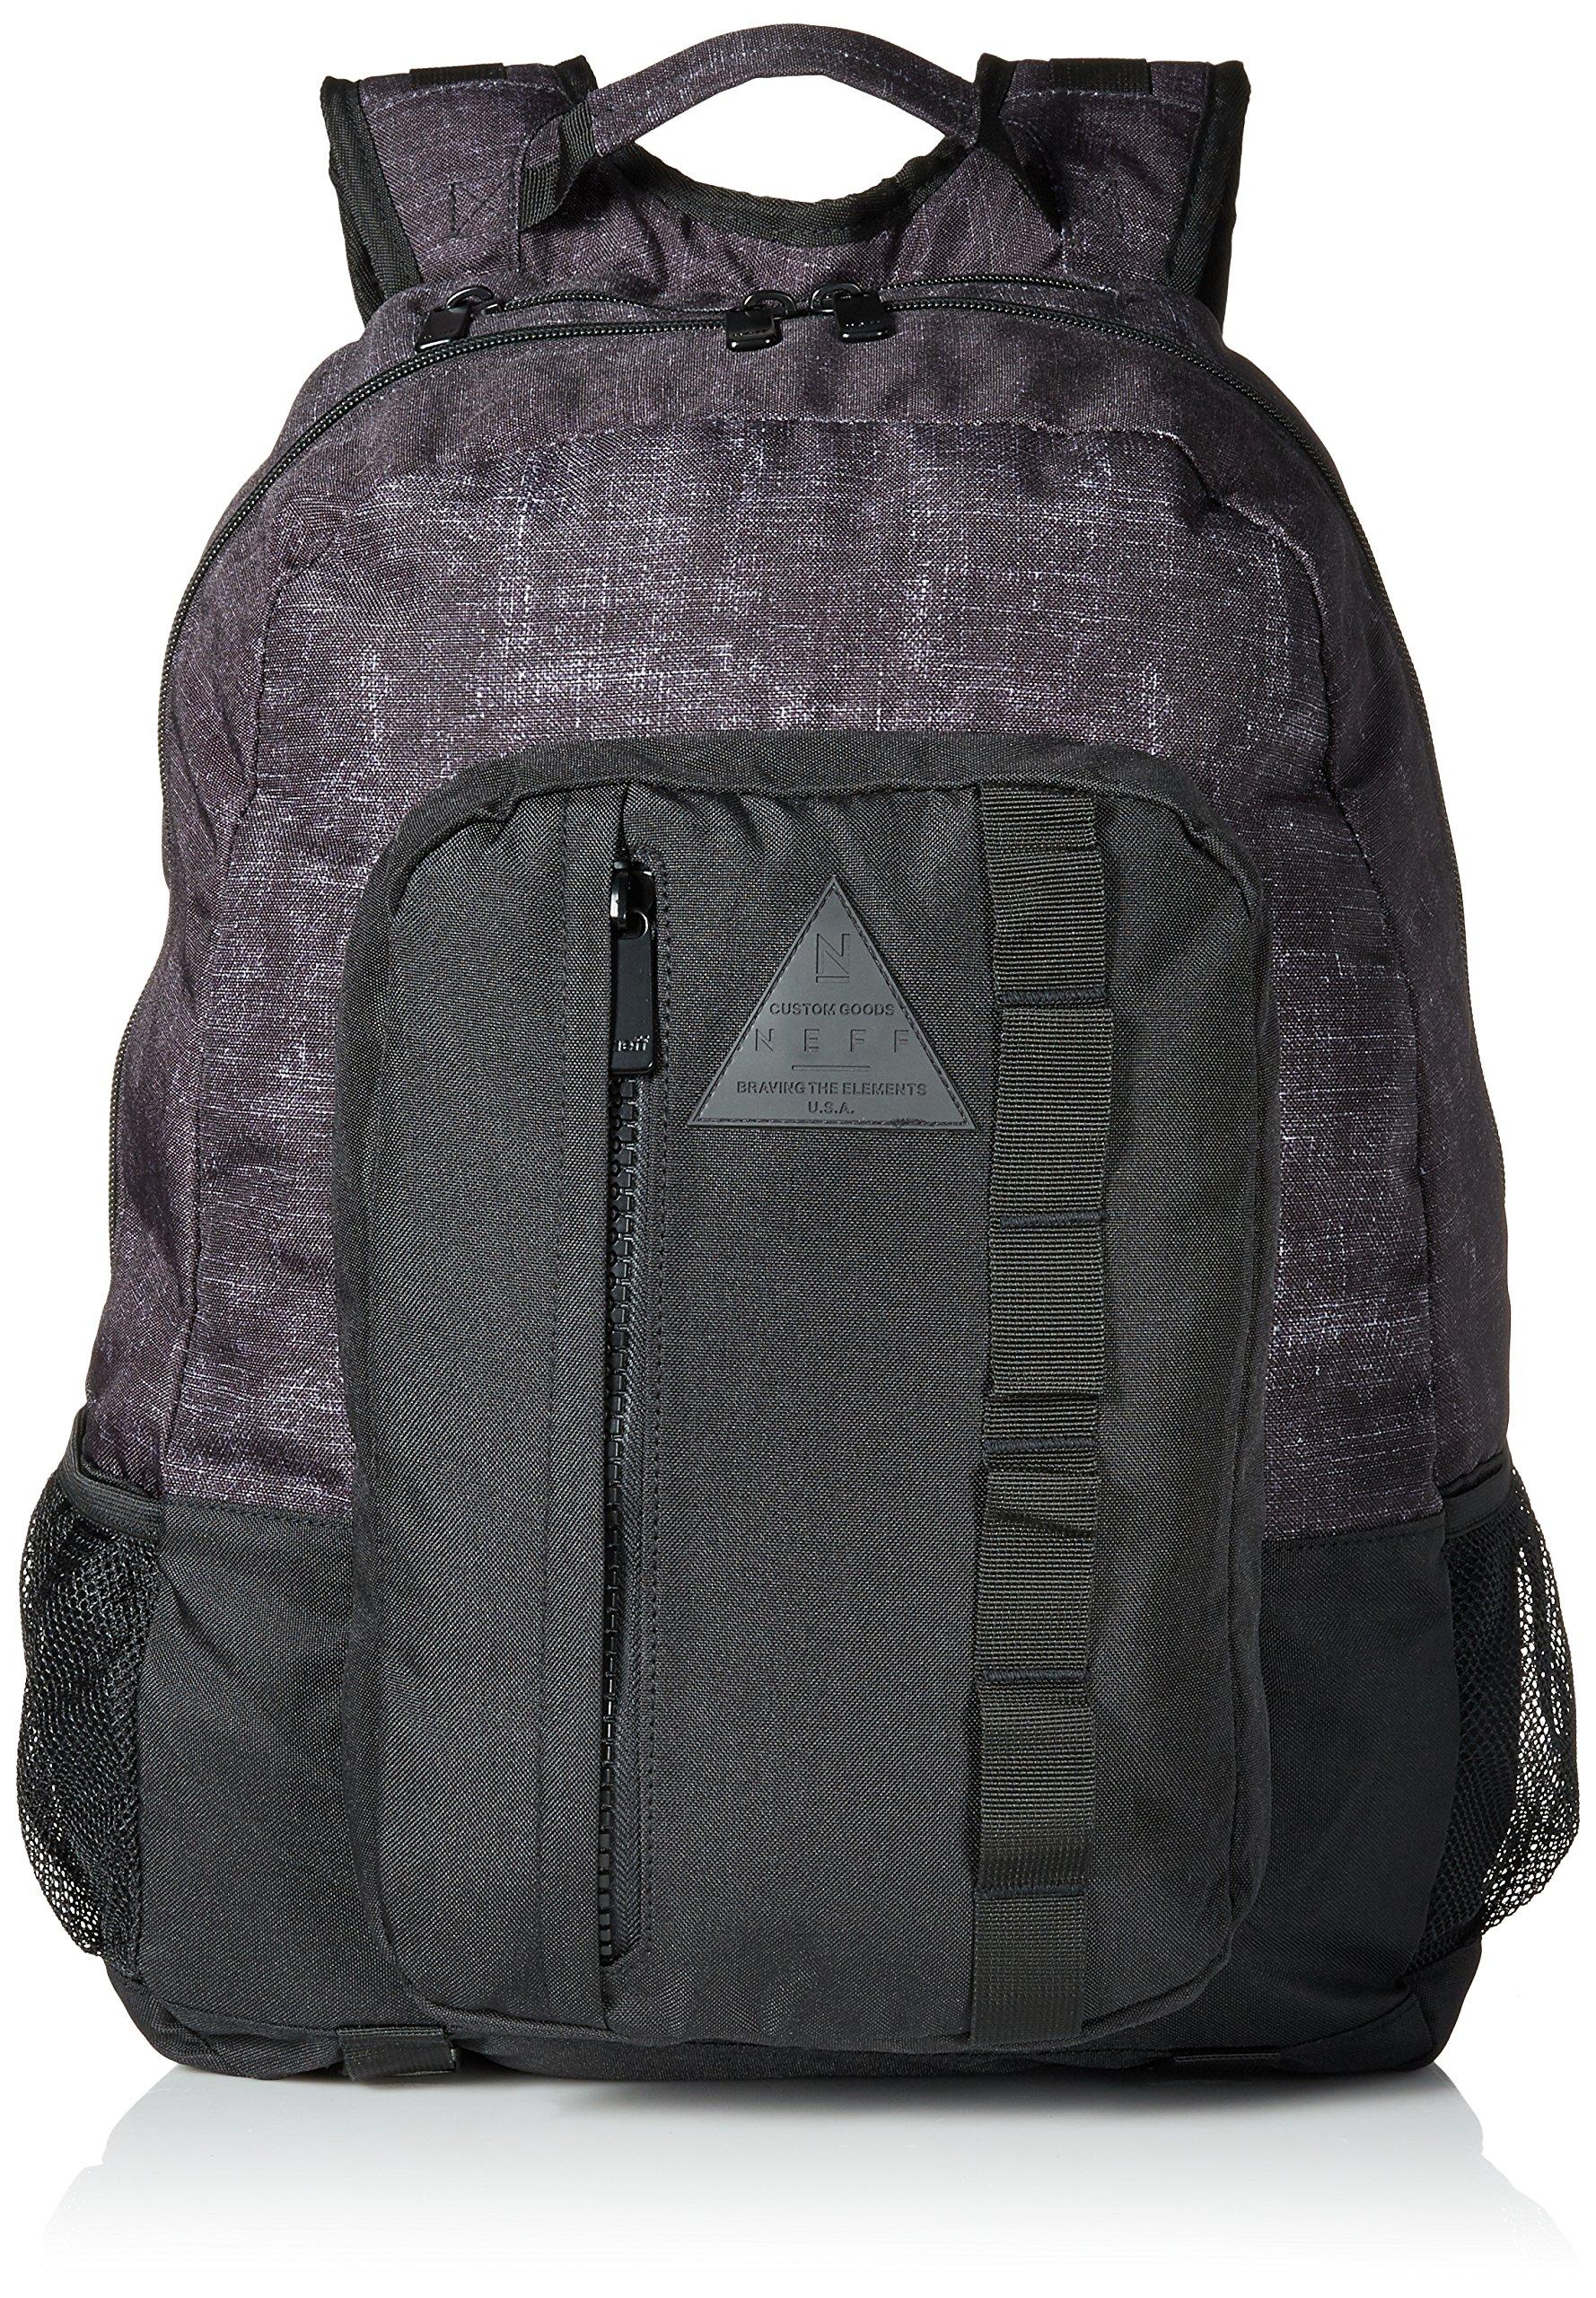 Neff Men's Renegade Backpacks, Renegade Black, One Size